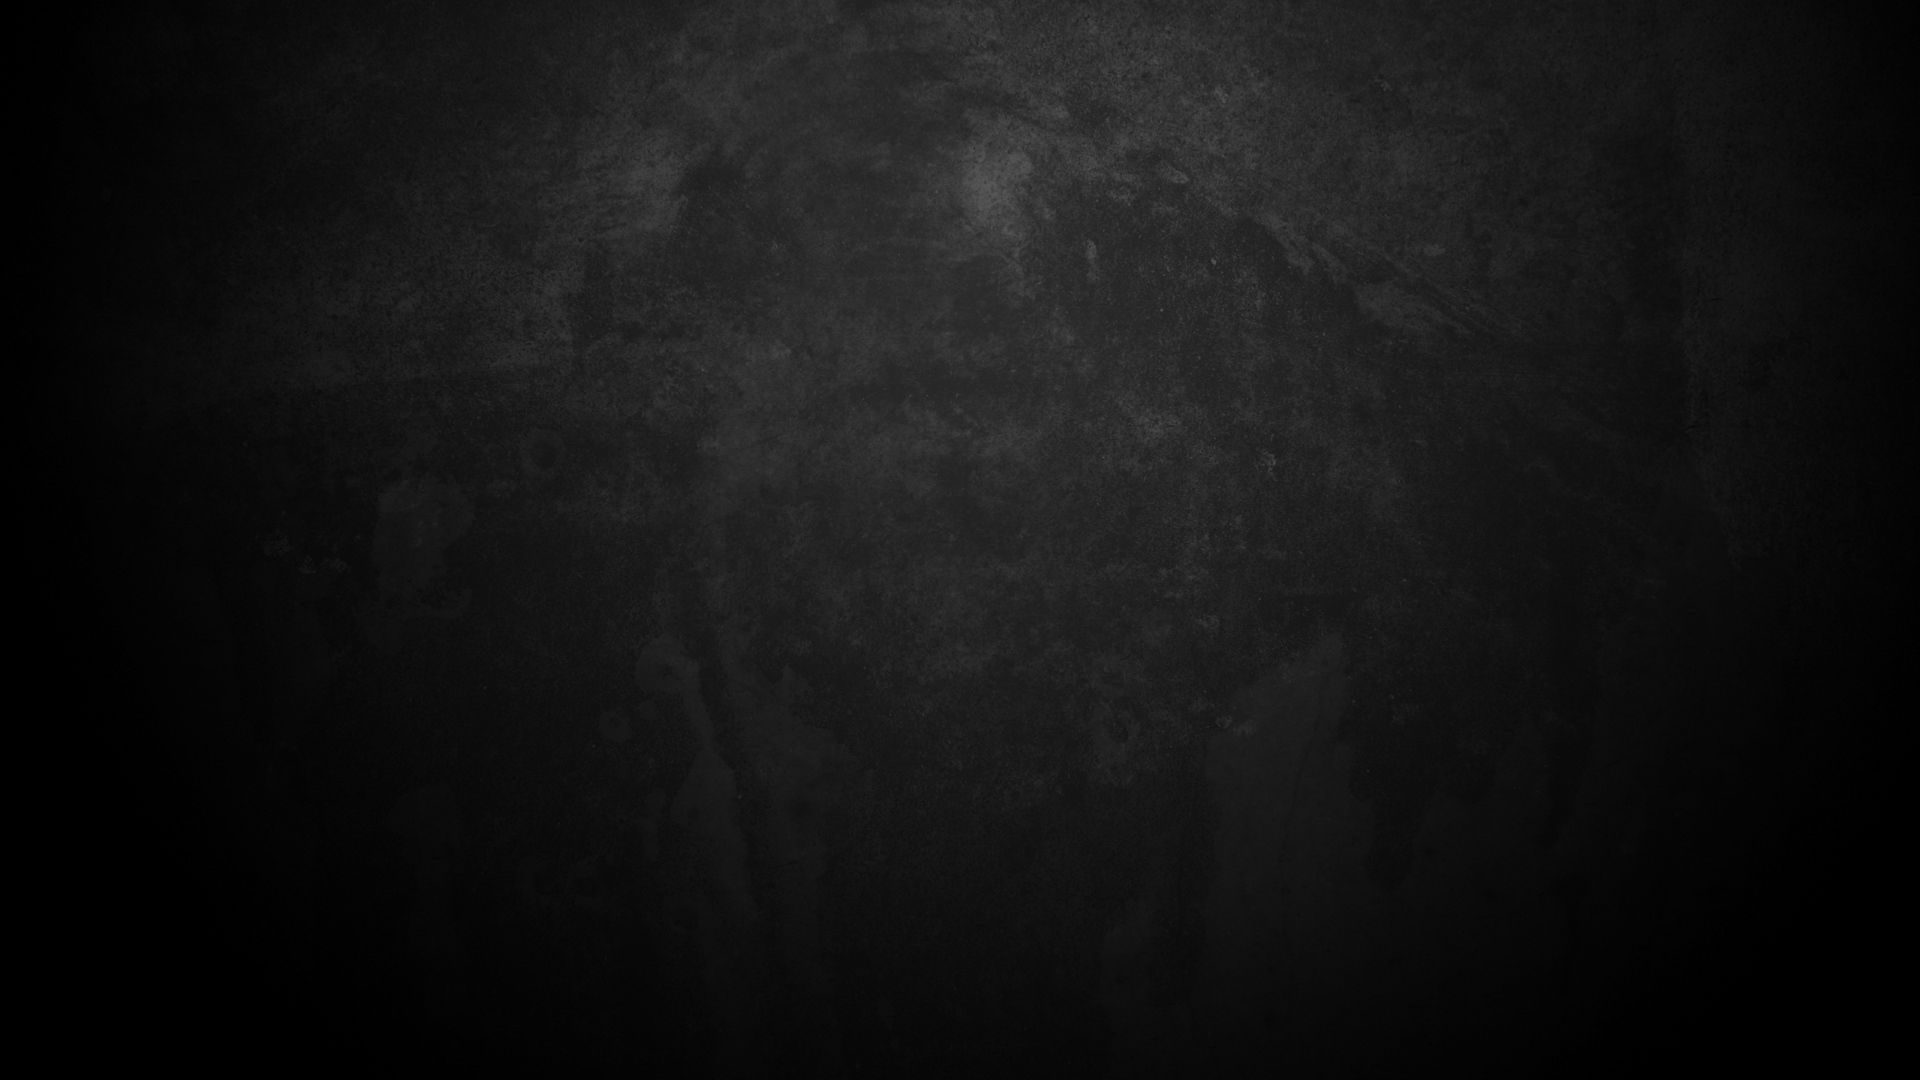 black texture wallpaper hd - photo #14